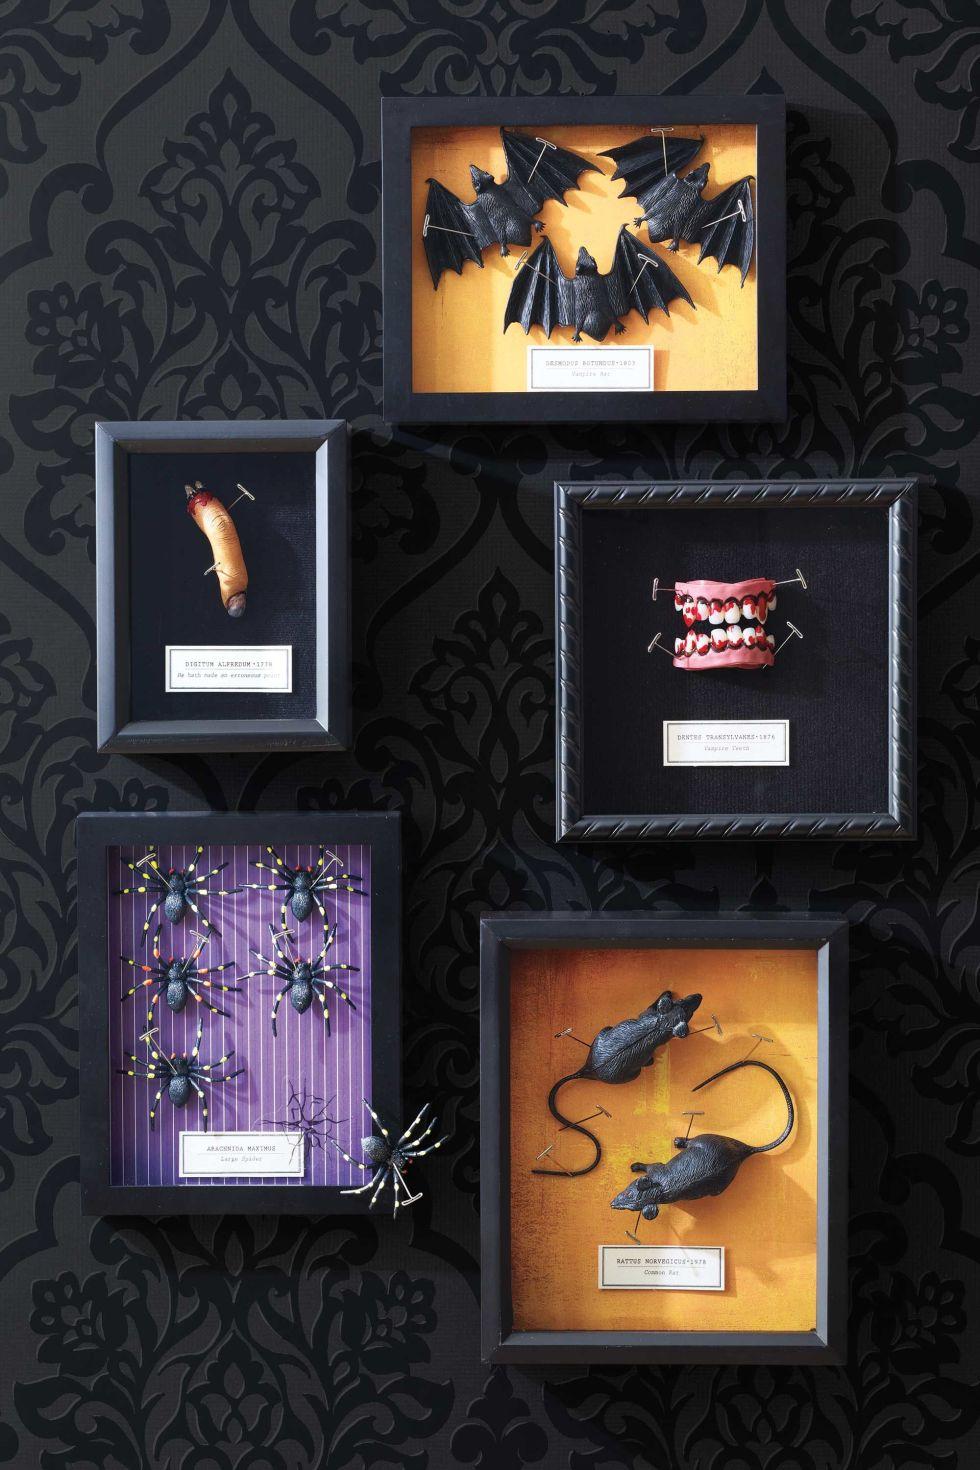 50 easy halloween decorations spooky home decor ideas for halloween - Inexpensive Halloween Decorations